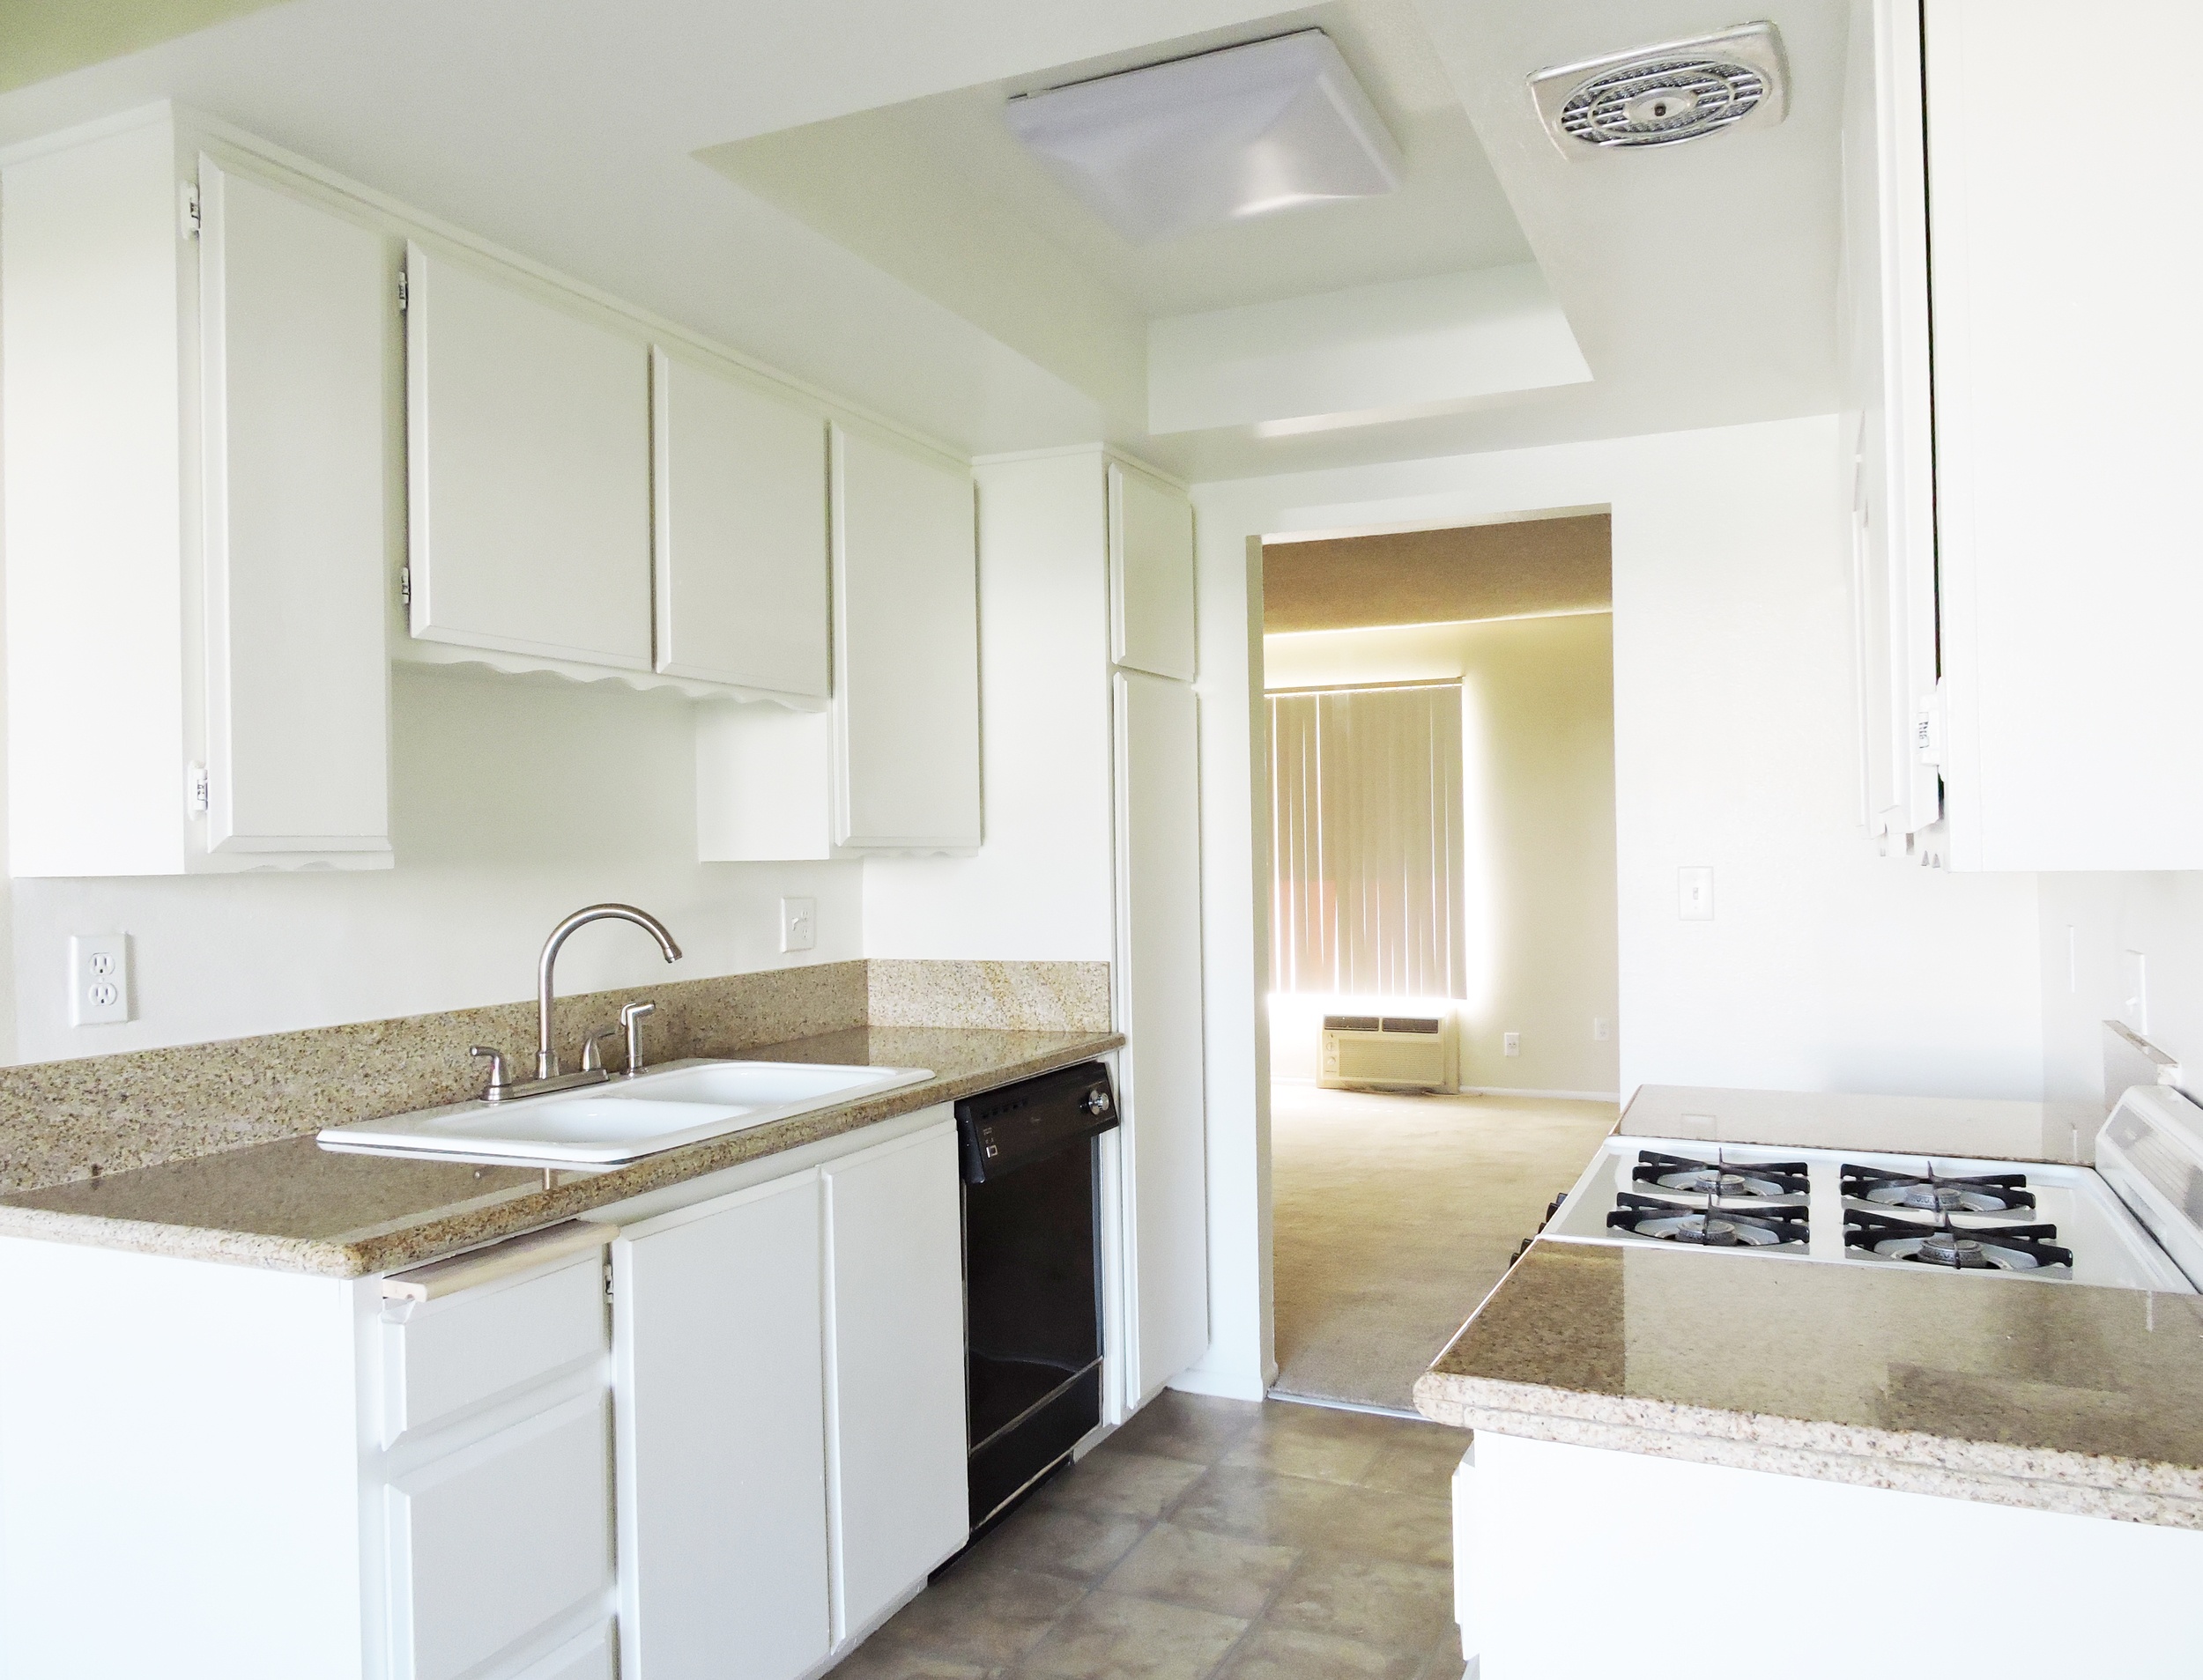 daisy kitchen.jpg